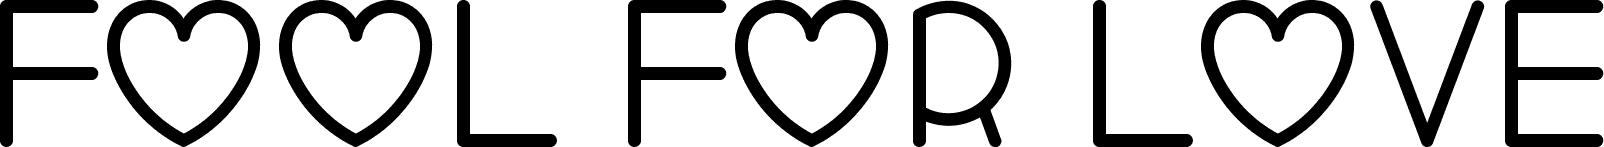 Fontes Personalizadas 01 Fool-for-love_4